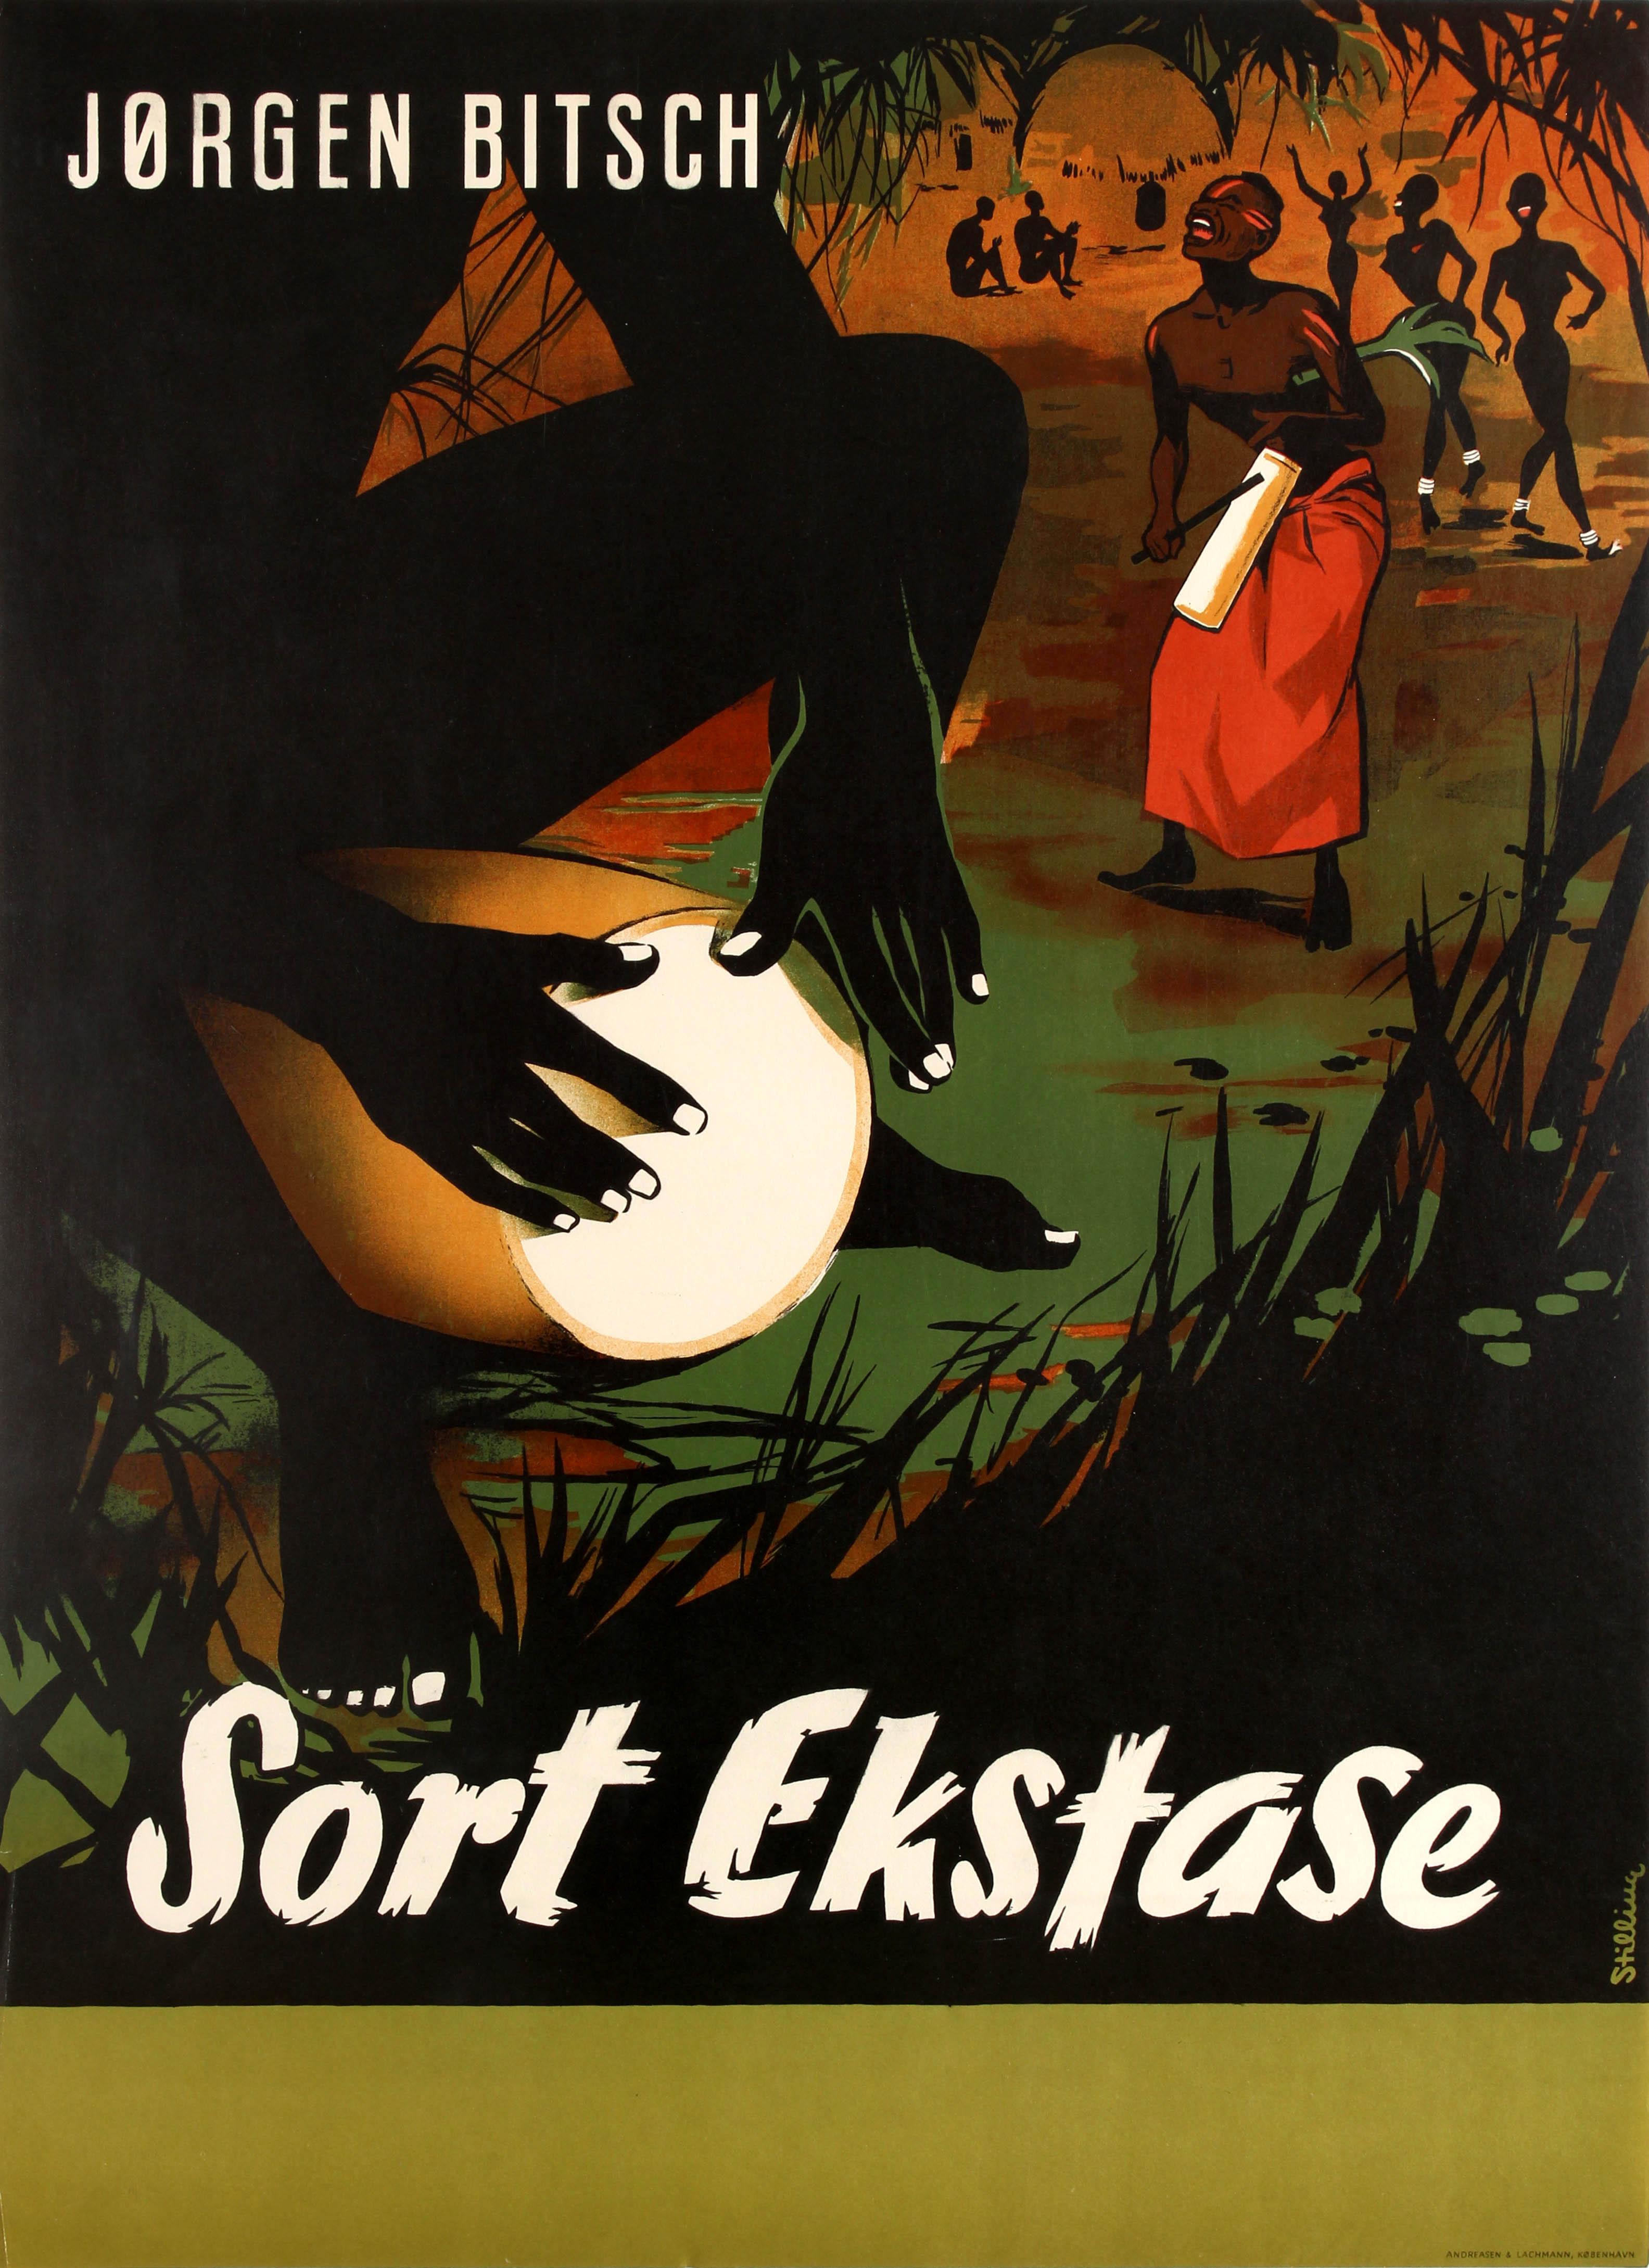 Movie Poster Sort Ekstase Africa Documentary Jorgen